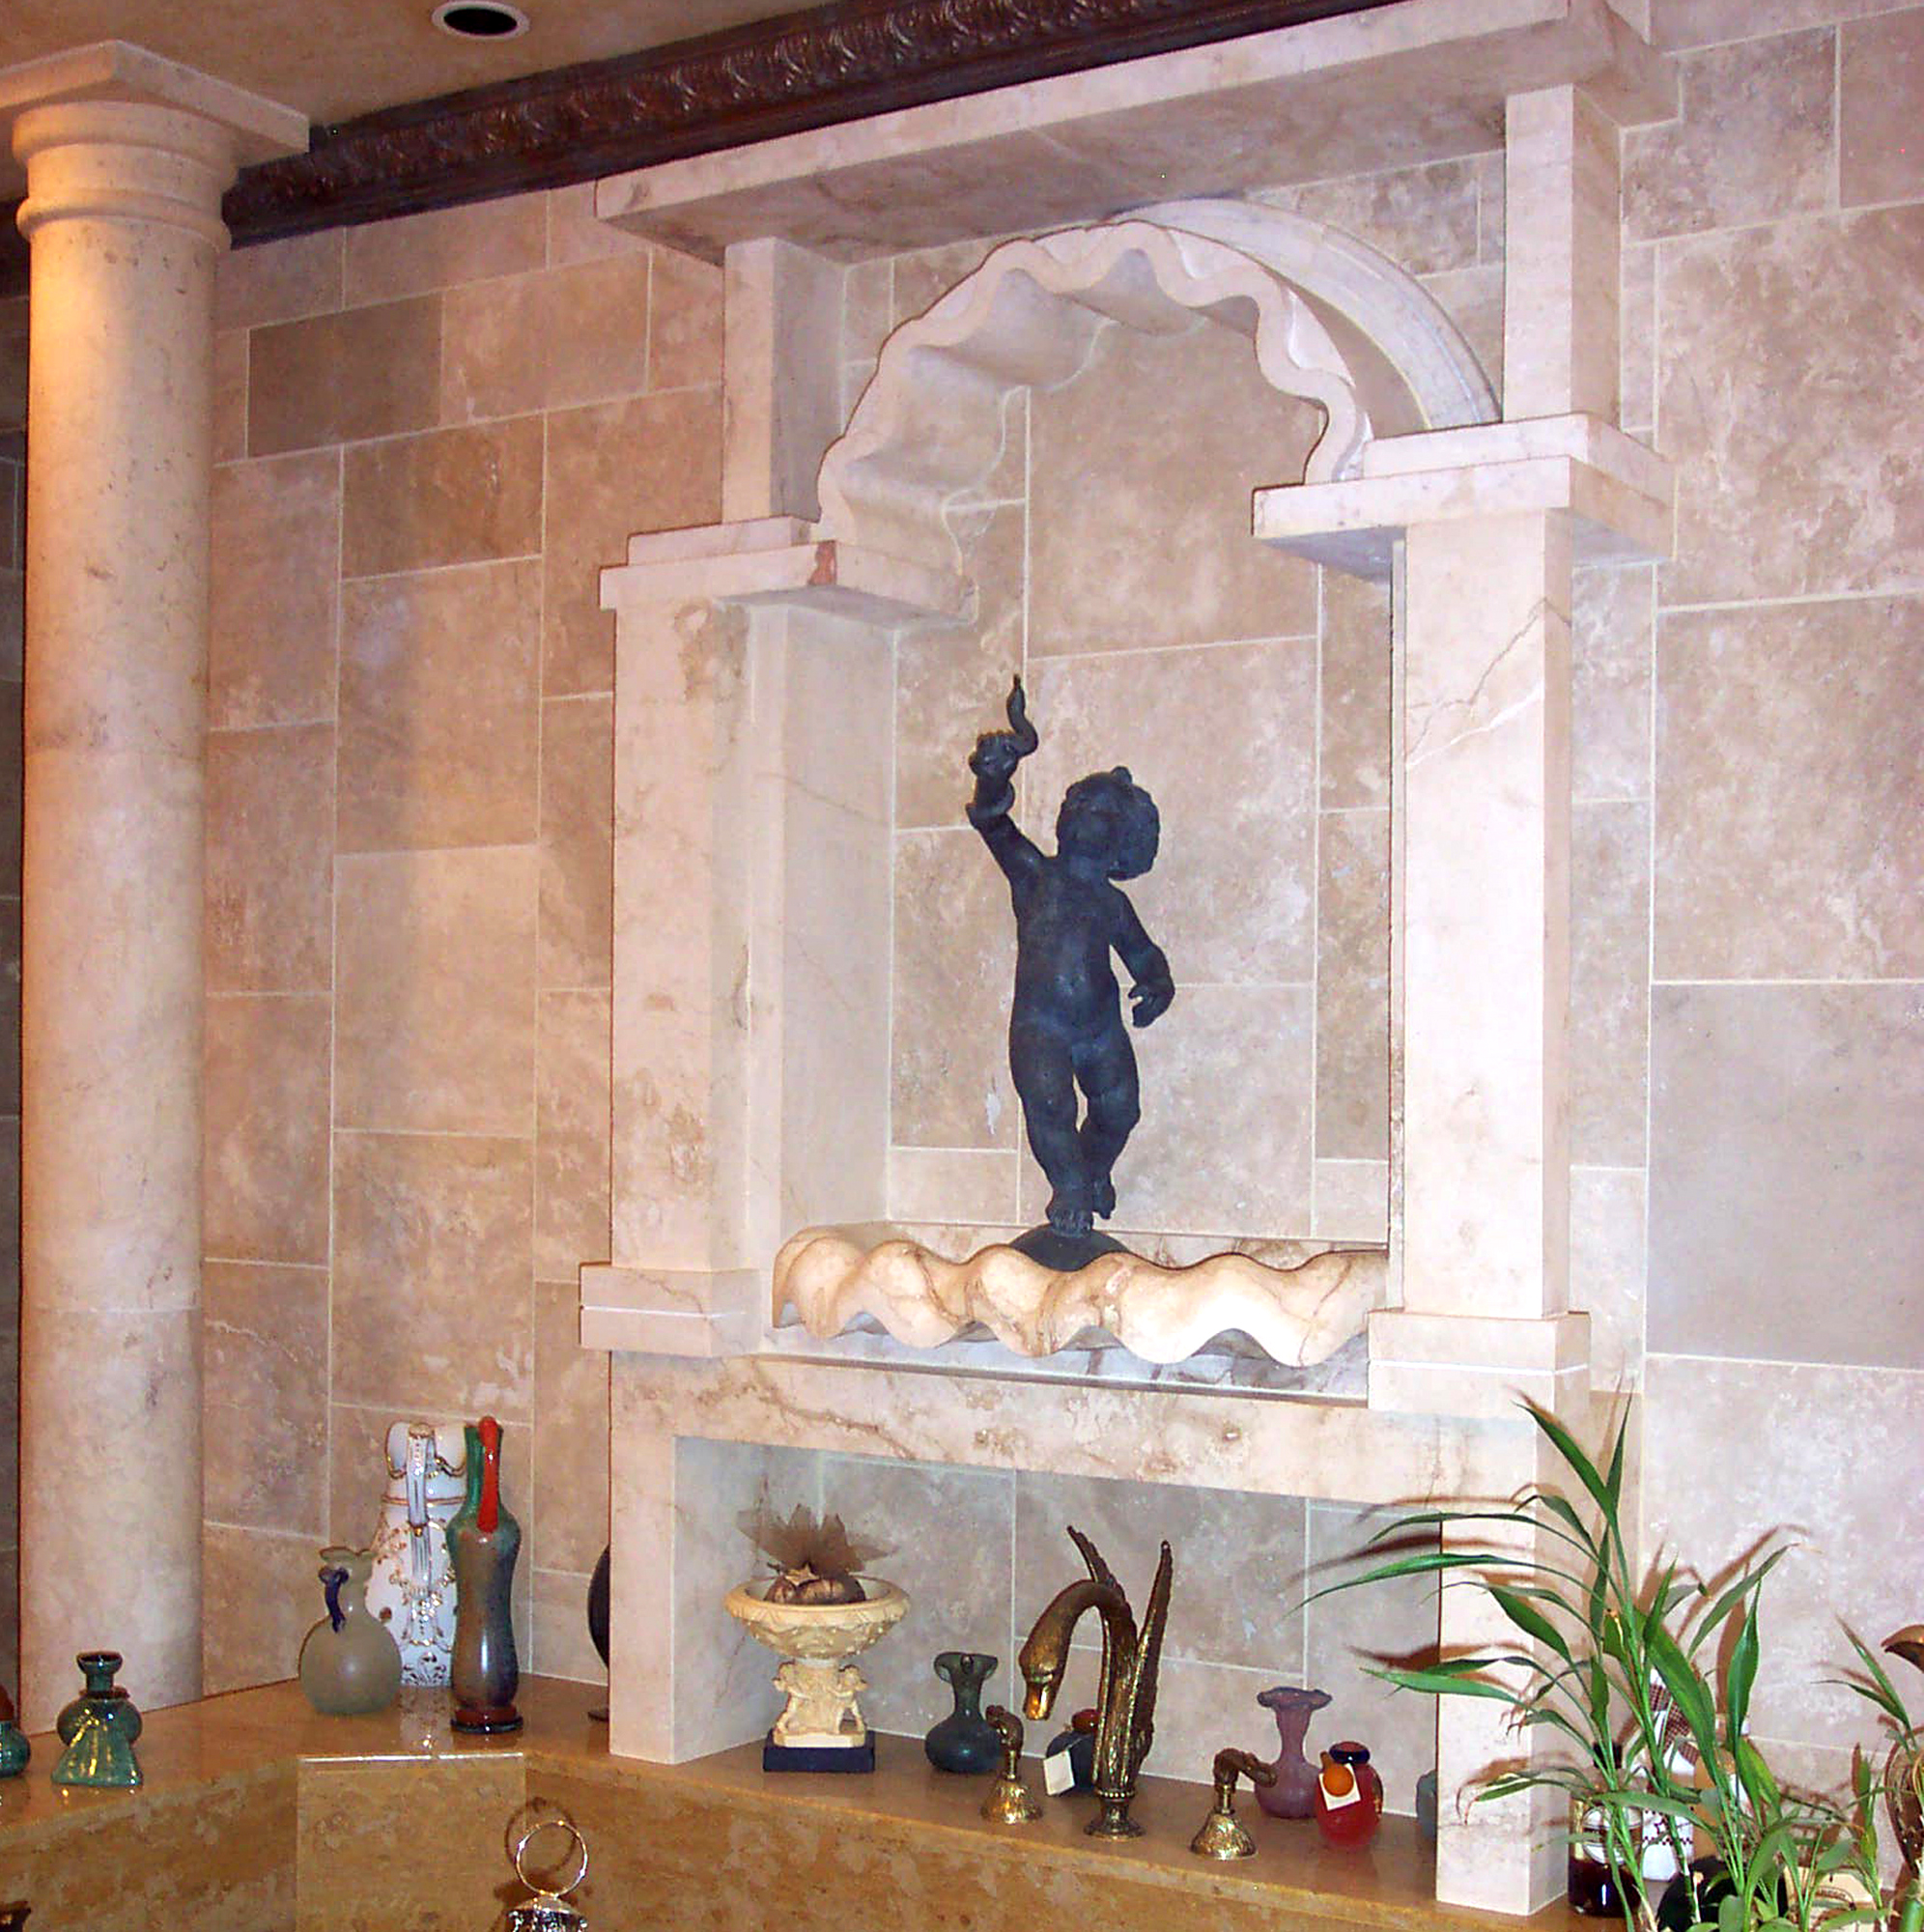 Classic Federal Style_Nasser_interiorBath fountain_1992x2000_DCP_3030.jpg